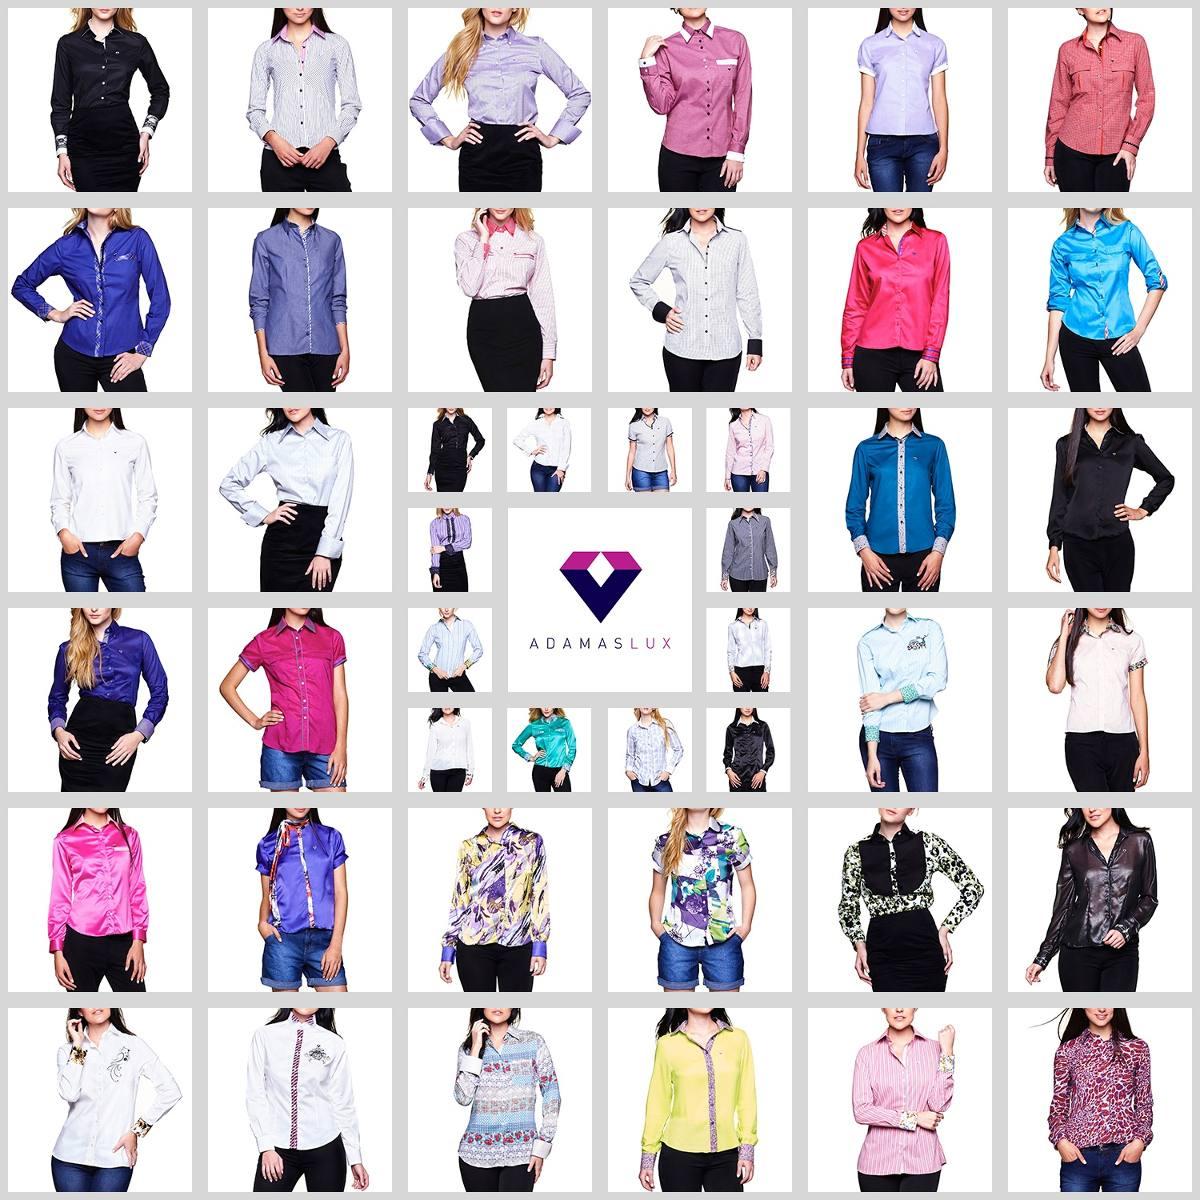 49267aa2d0 Camisa Feminina Blusa Listrada Cinza Manga Longa Regular - R  39